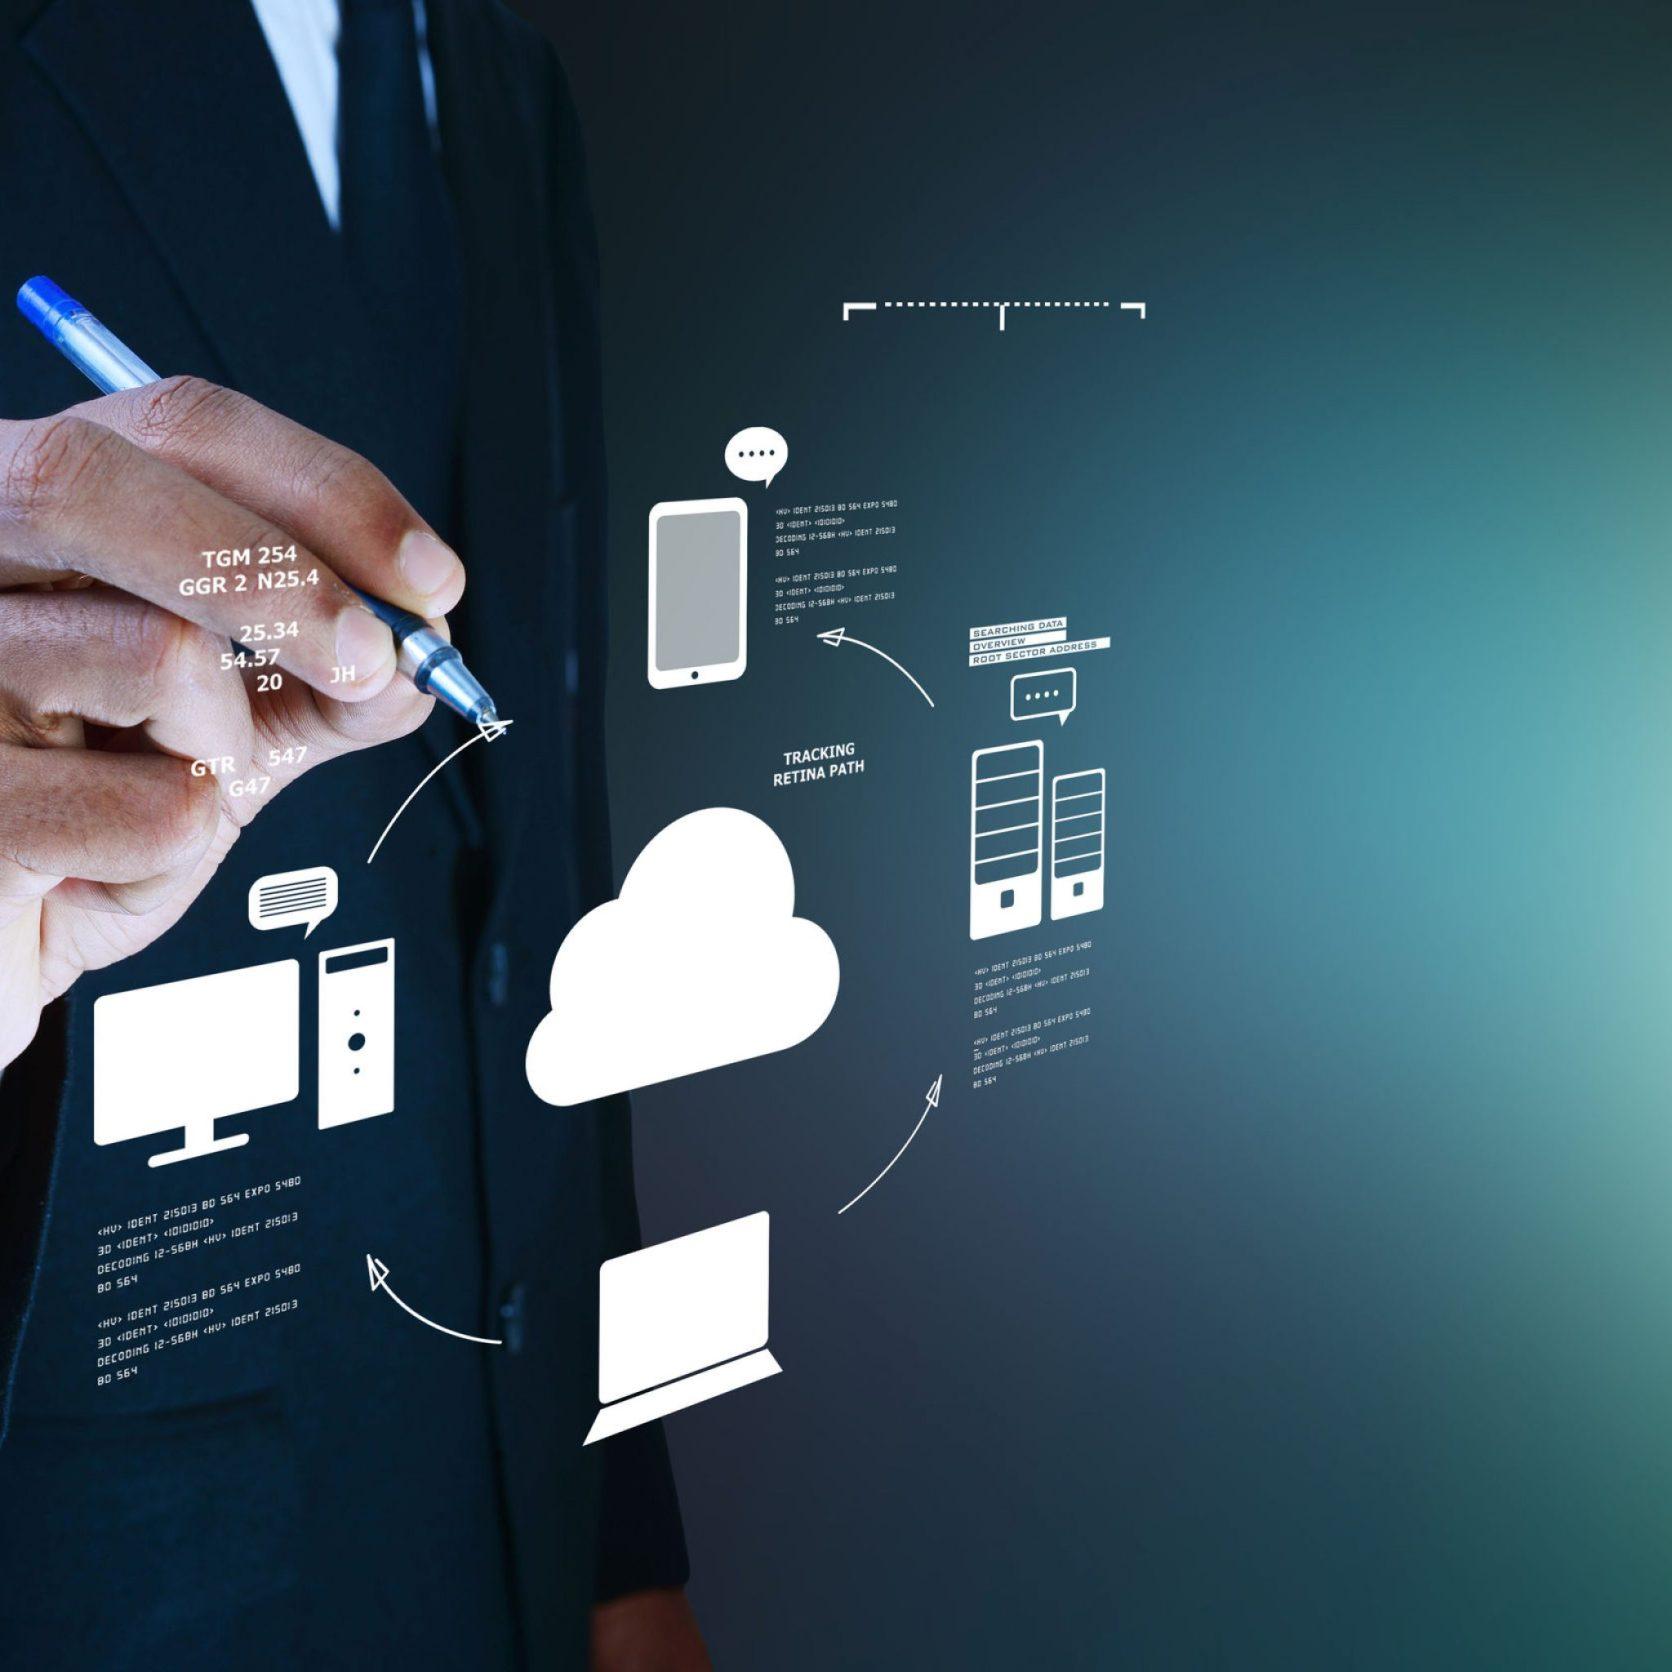 cloud computing 101 advantages and disadvantages - Being Your Own Boss Advantages And Disadvantages